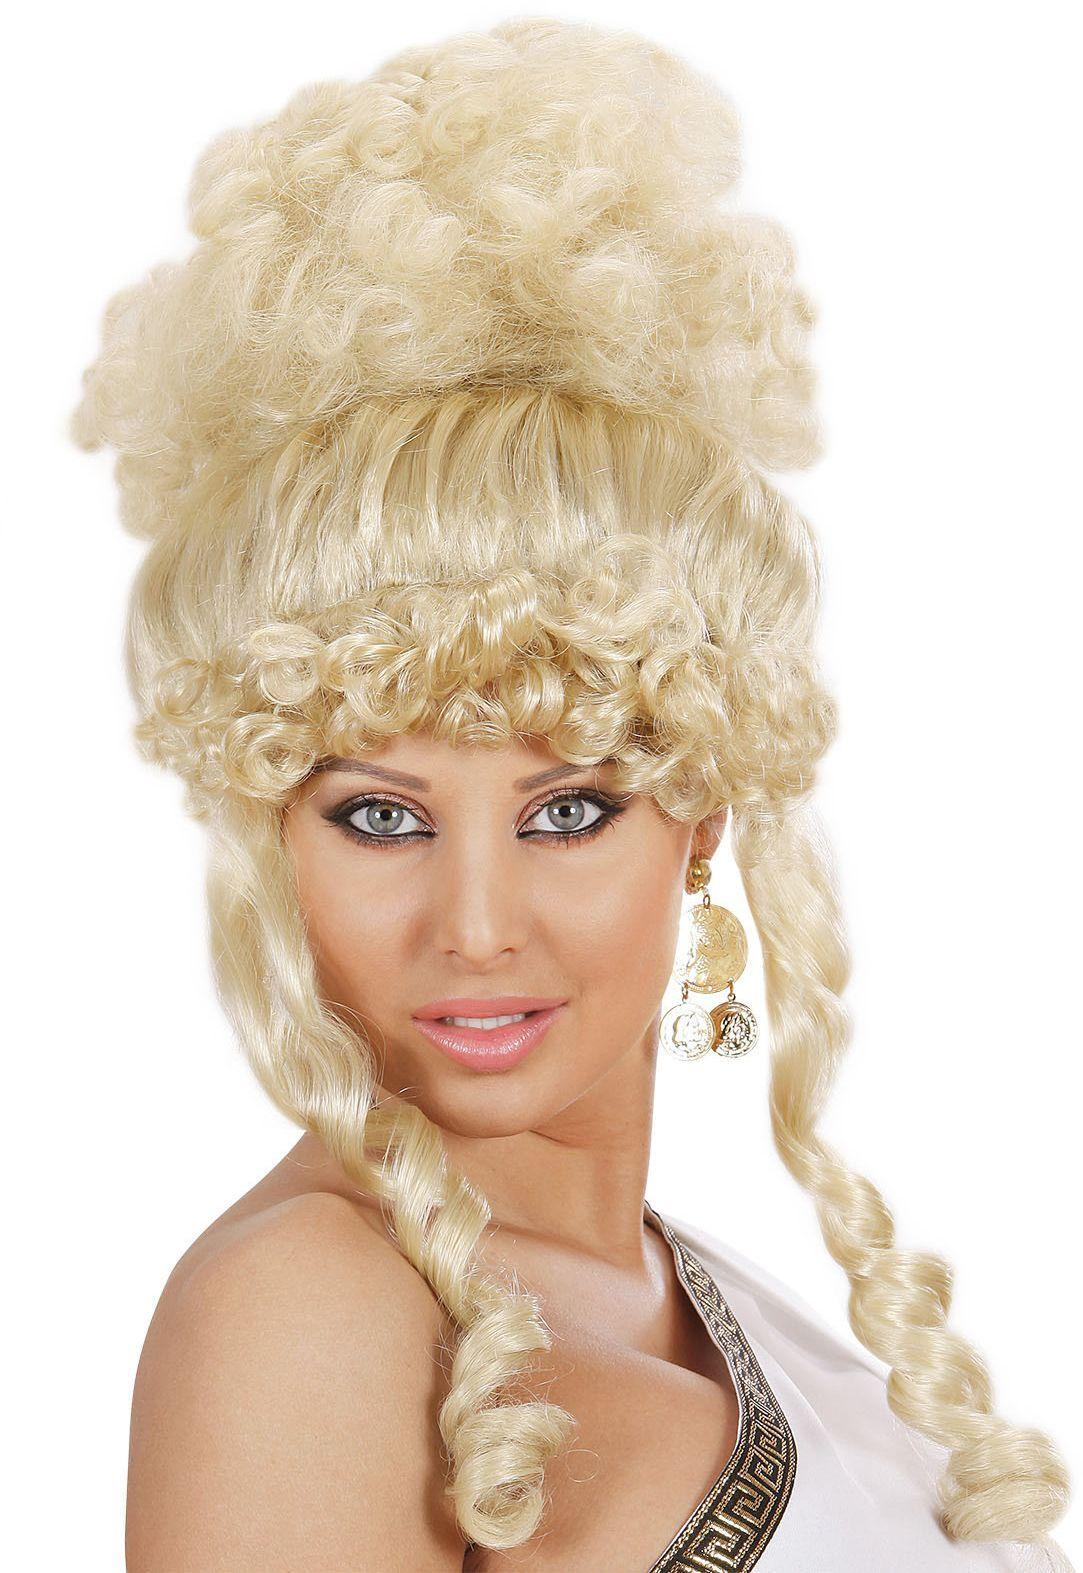 Griekse godin pruik blond